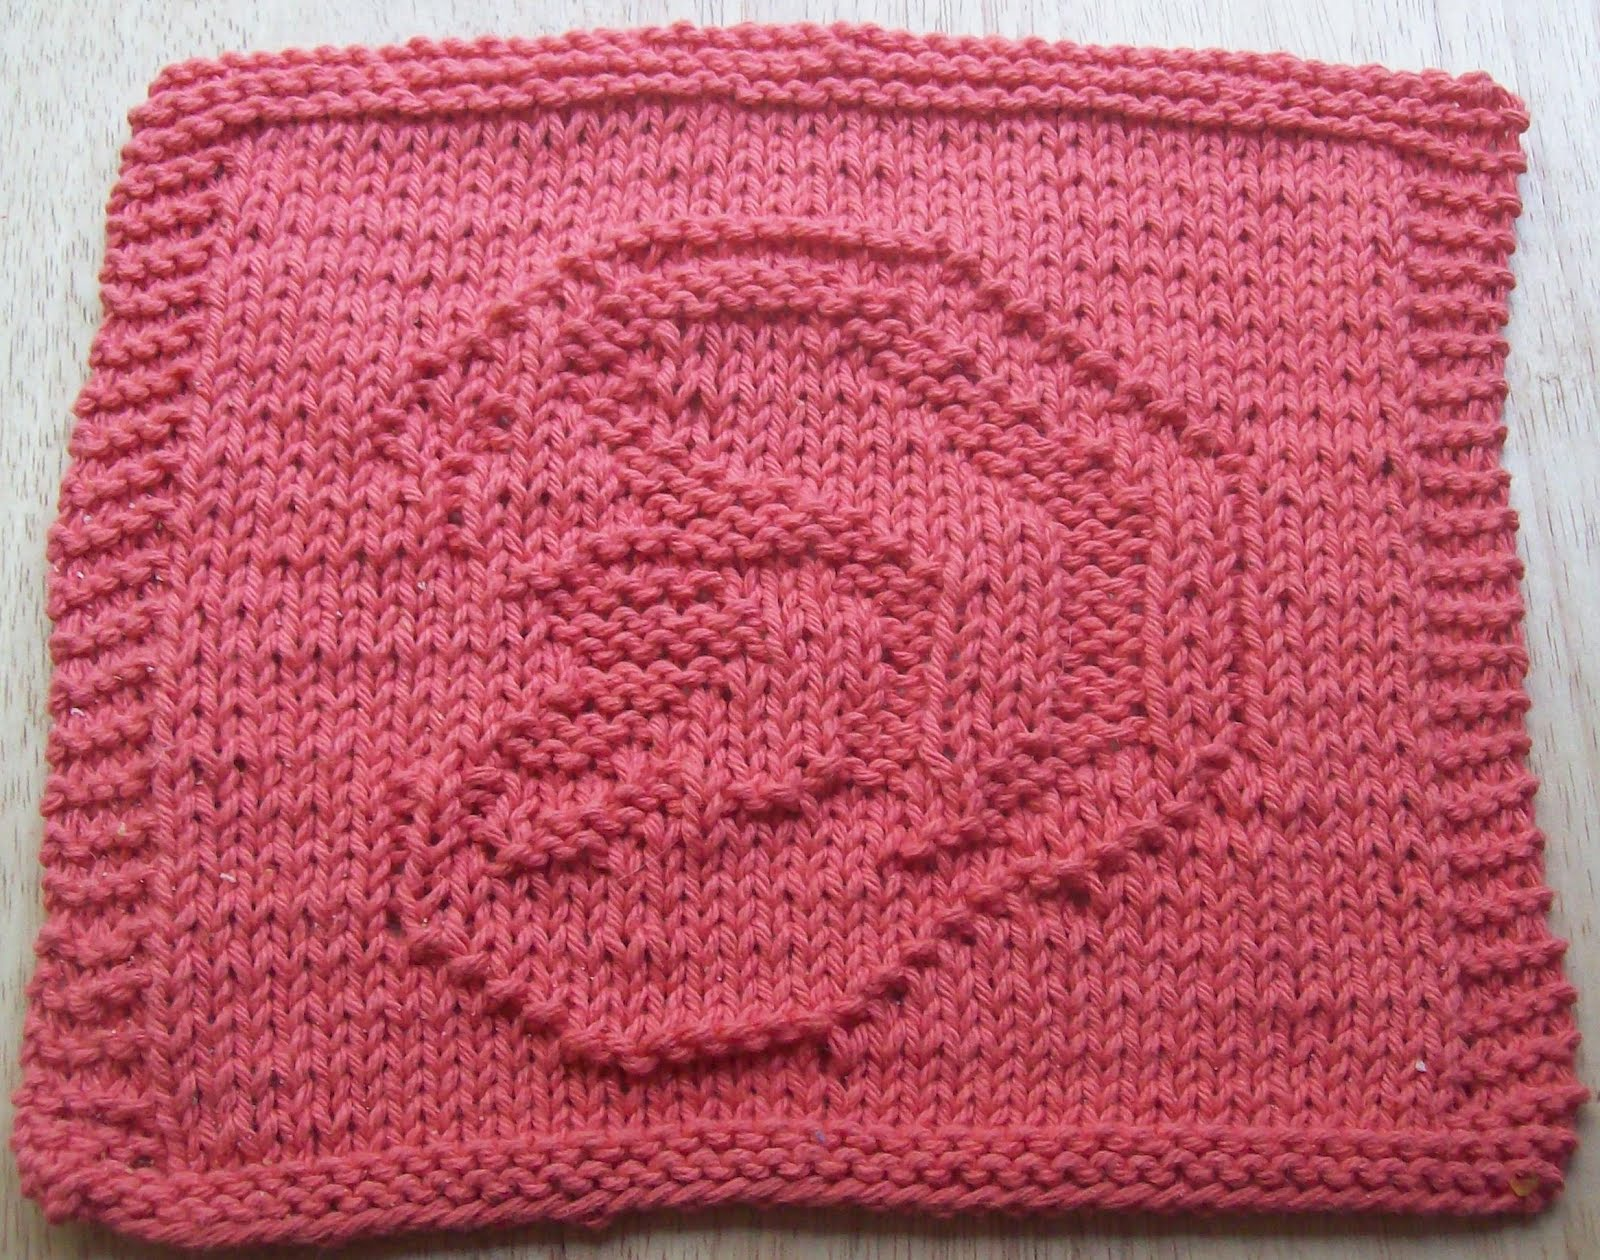 Simple Knit Dishcloth Pattern : DigKnitty Designs: Ear Knit Dishcloth Pattern